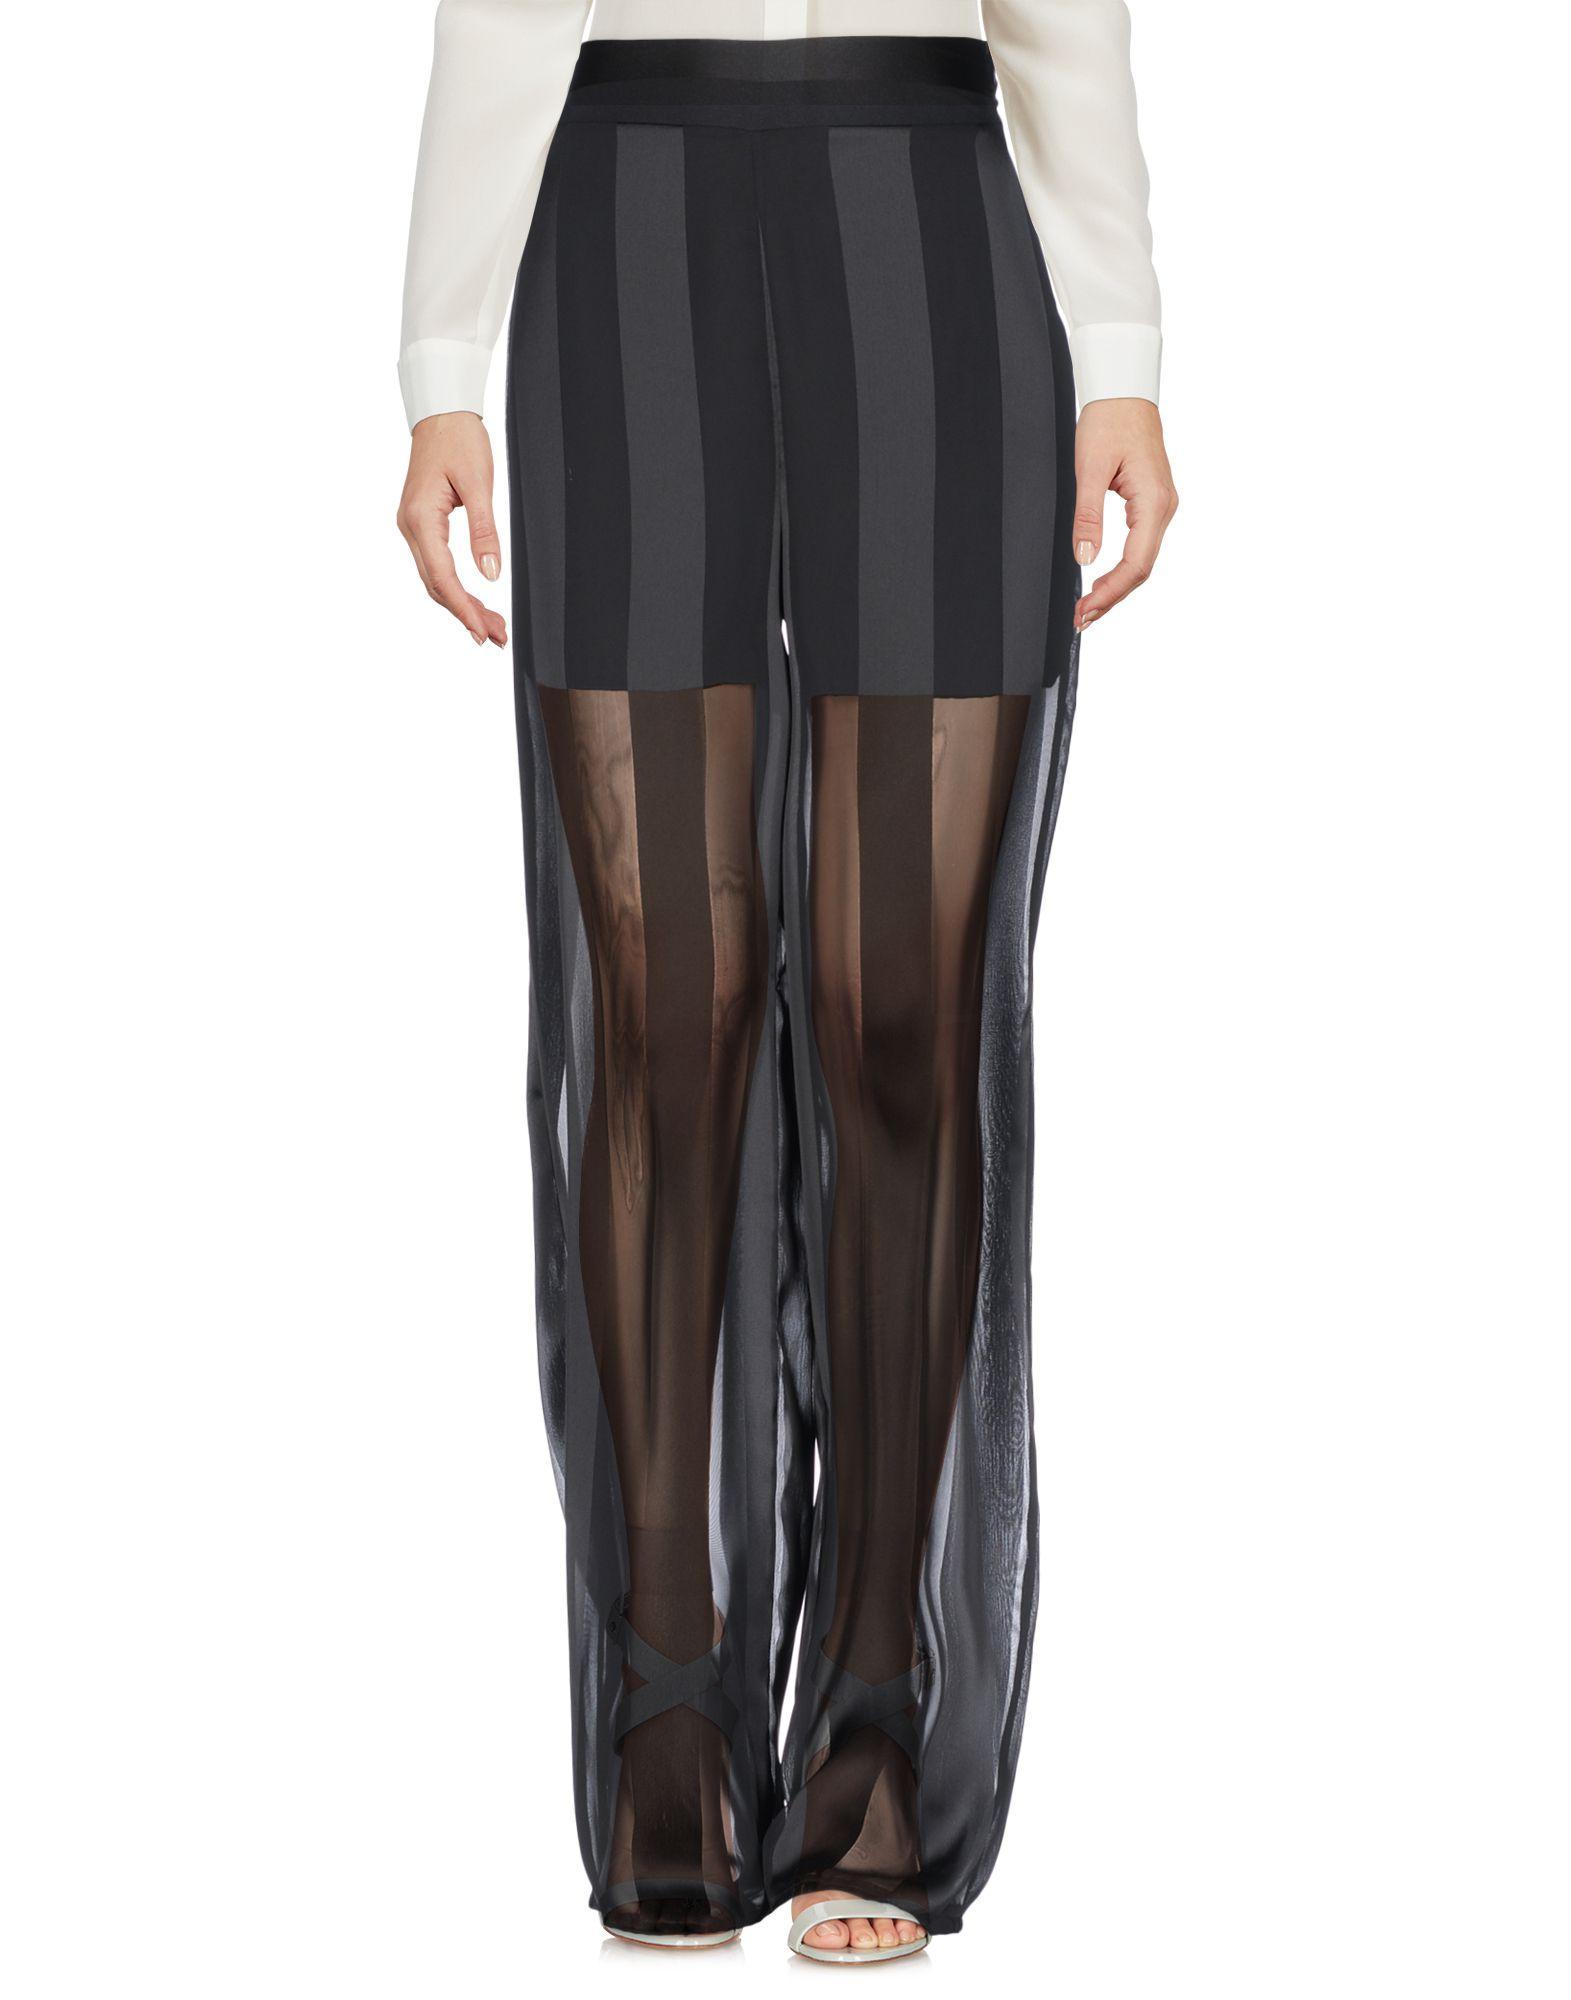 Pantalone Pantalone Pantalone Kaos donna - 13100396VW 87e